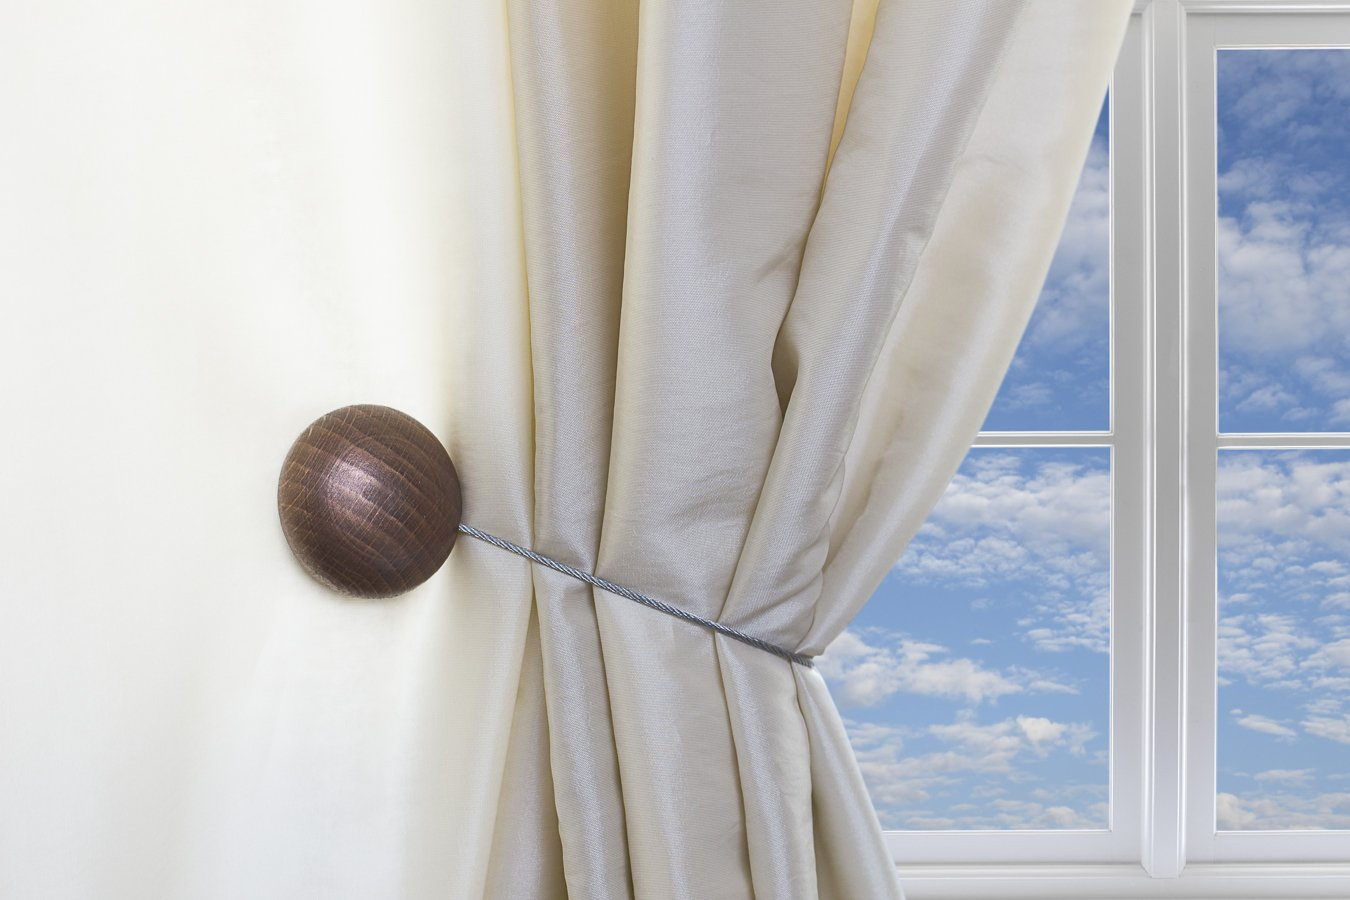 Magnaclips Curtain Tiebacks, Leno Bronze